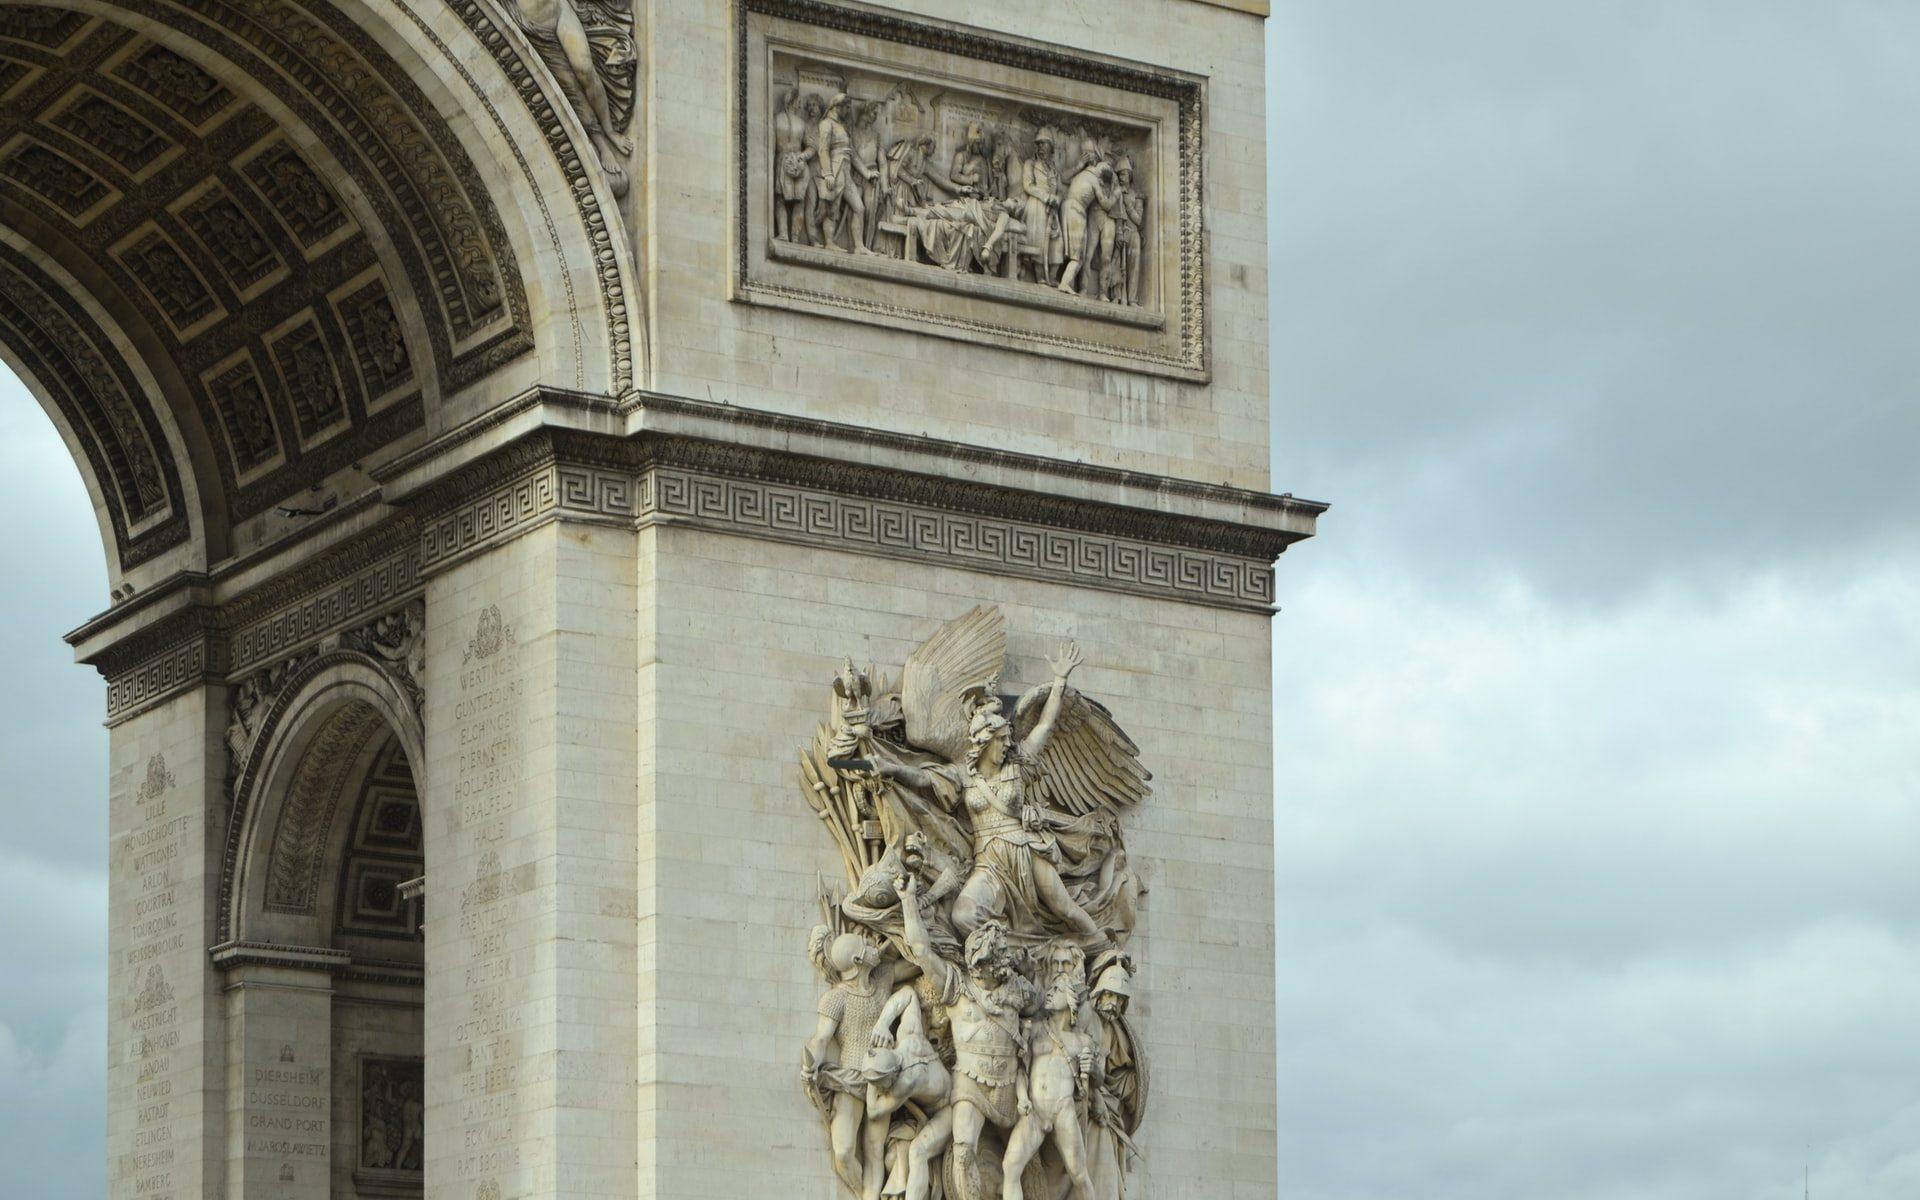 Modernism threatened the Roman Catholic Church in Europe